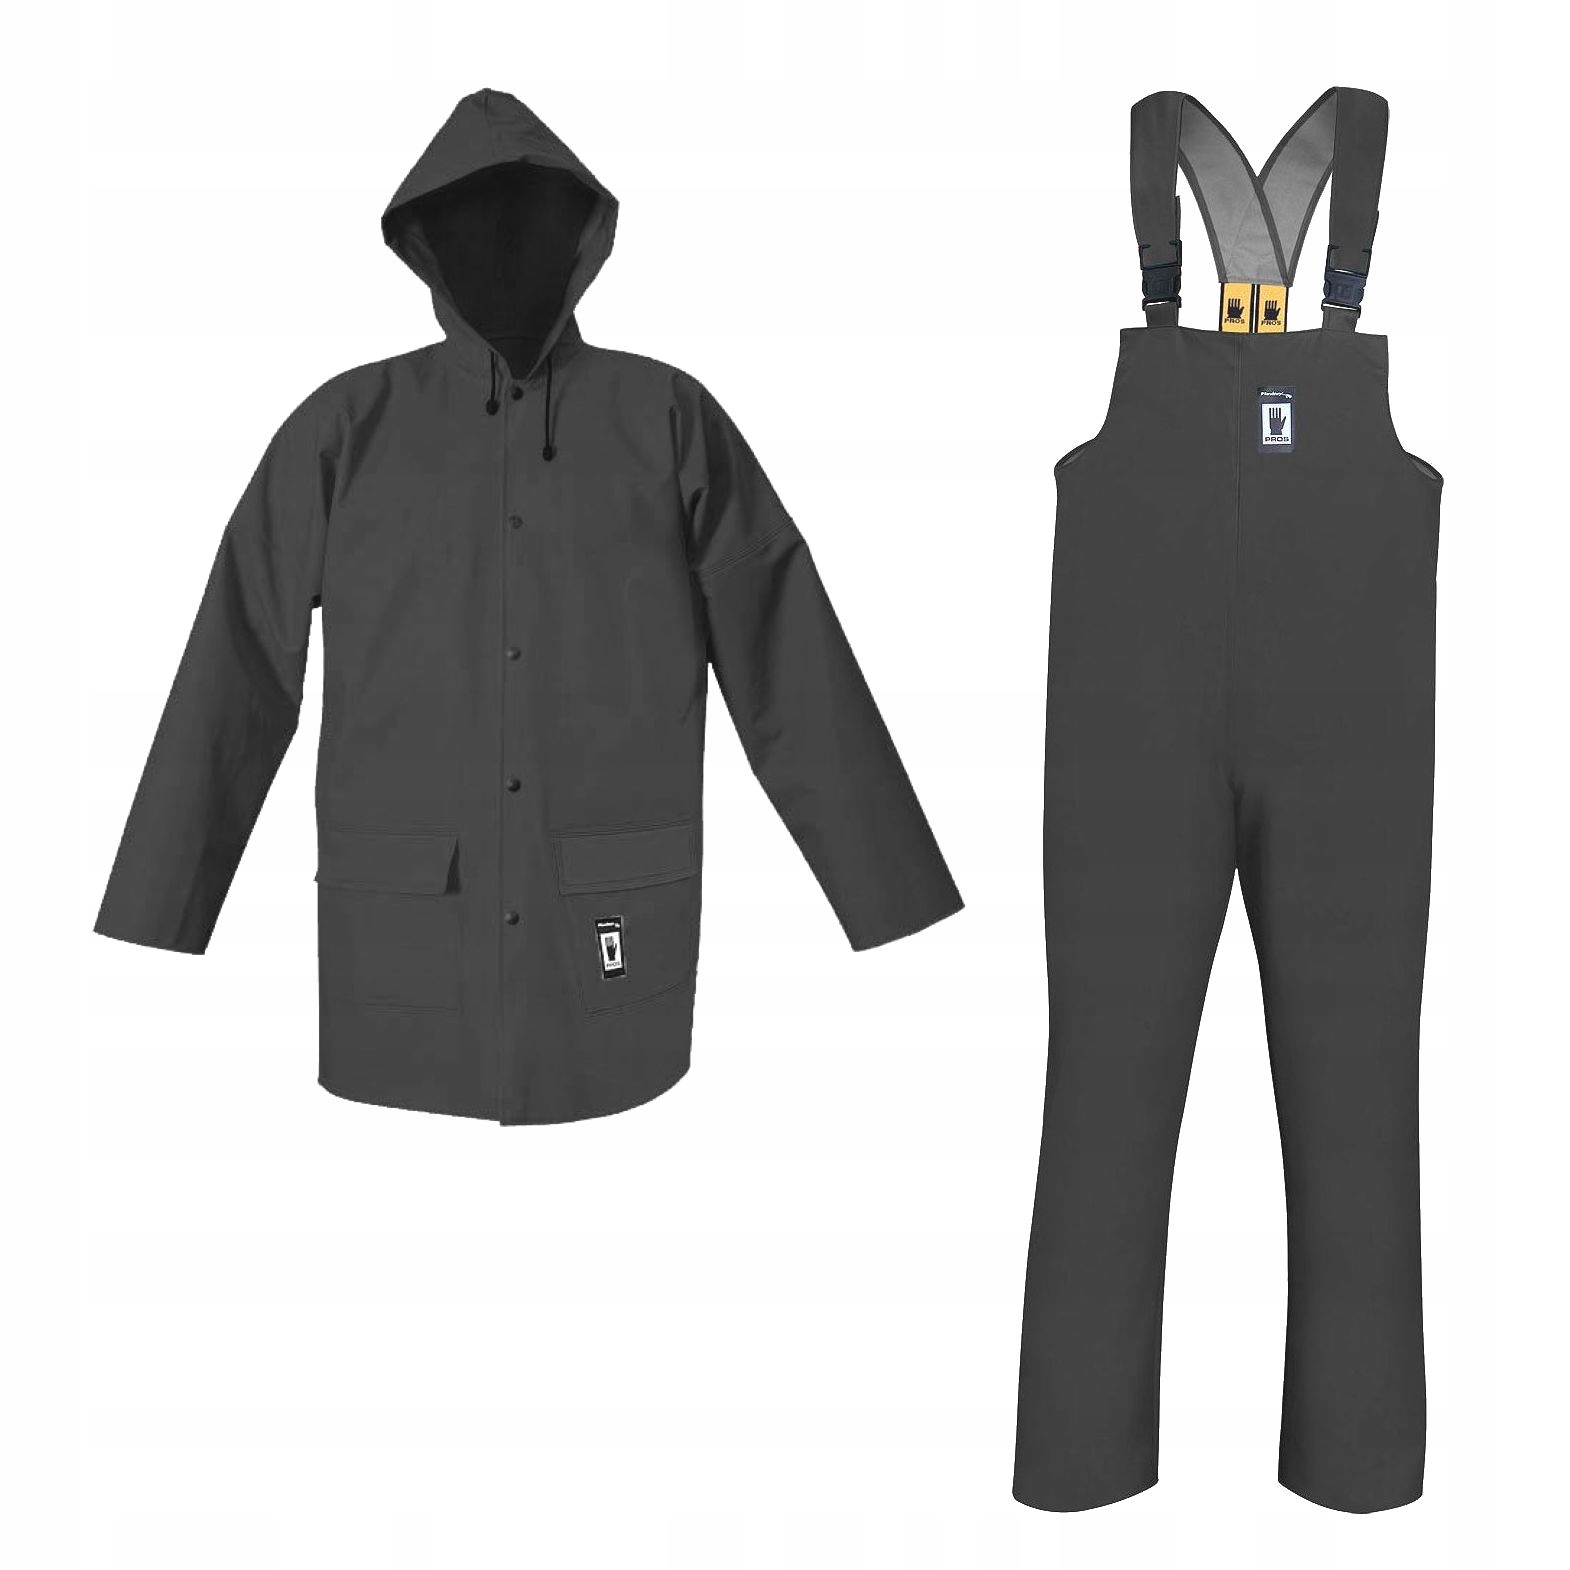 Одежда, плащи 101/001 сильные L серый